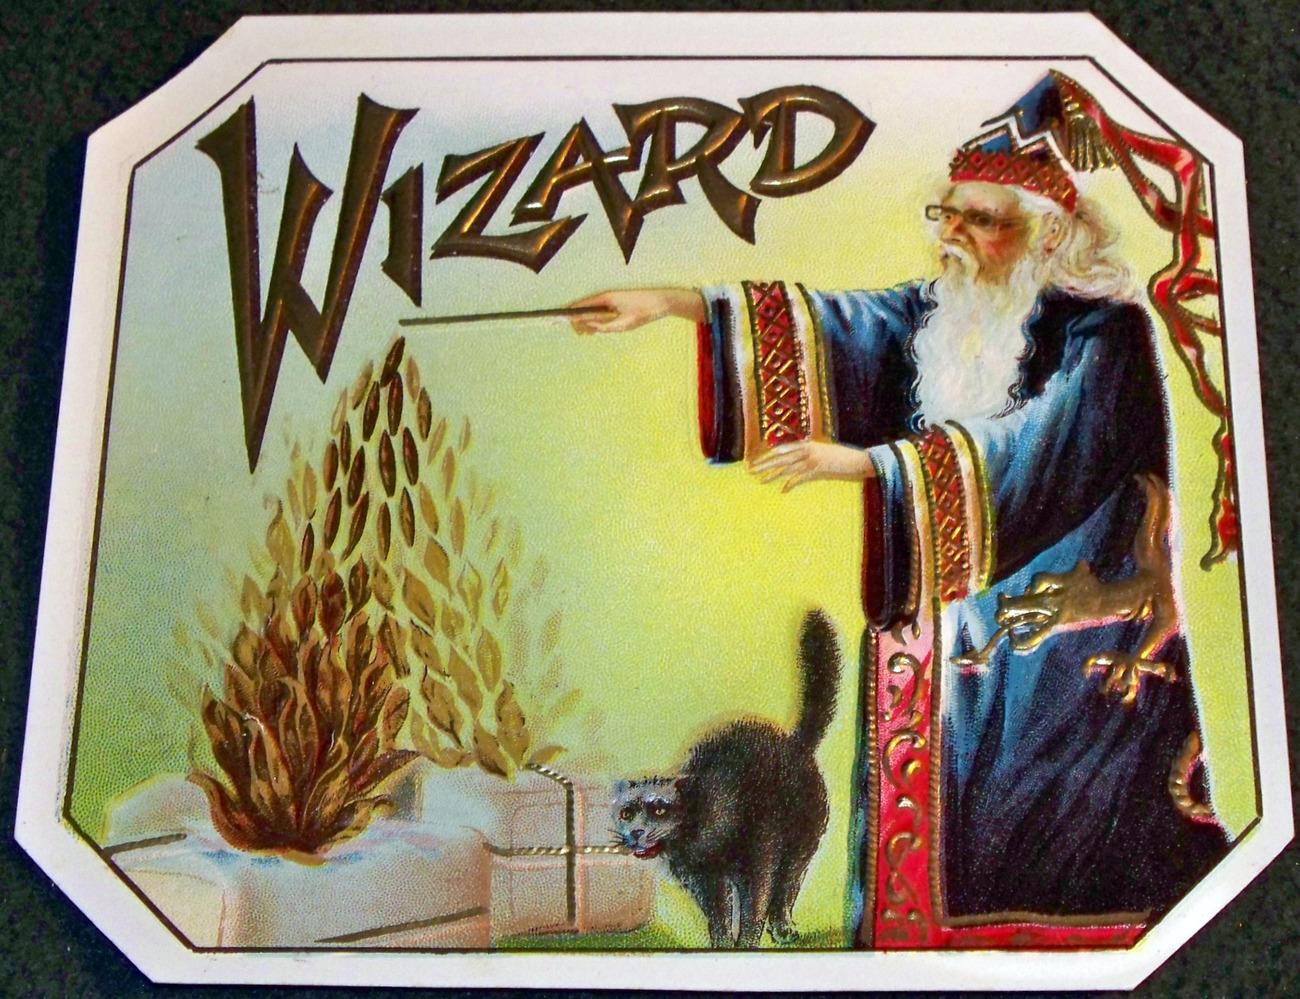 Wizard small label 001